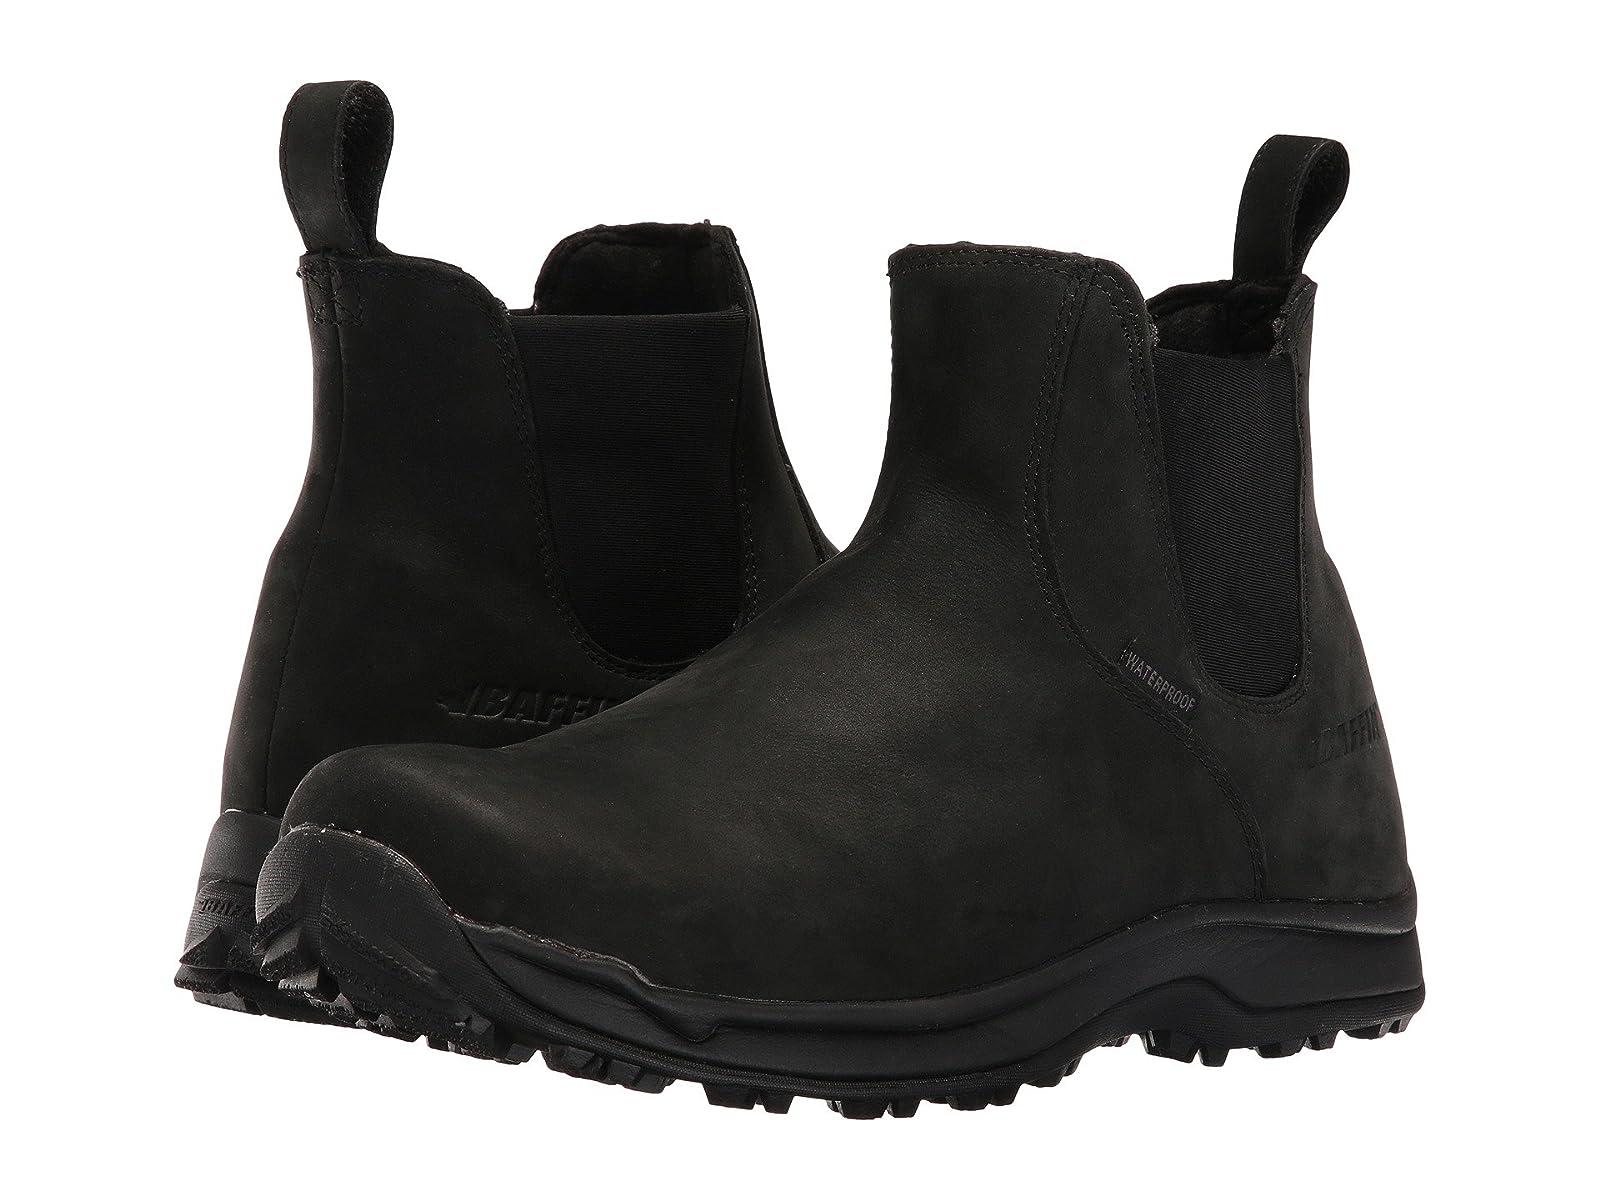 Baffin CopenhagenSelling fashionable and eye-catching shoes